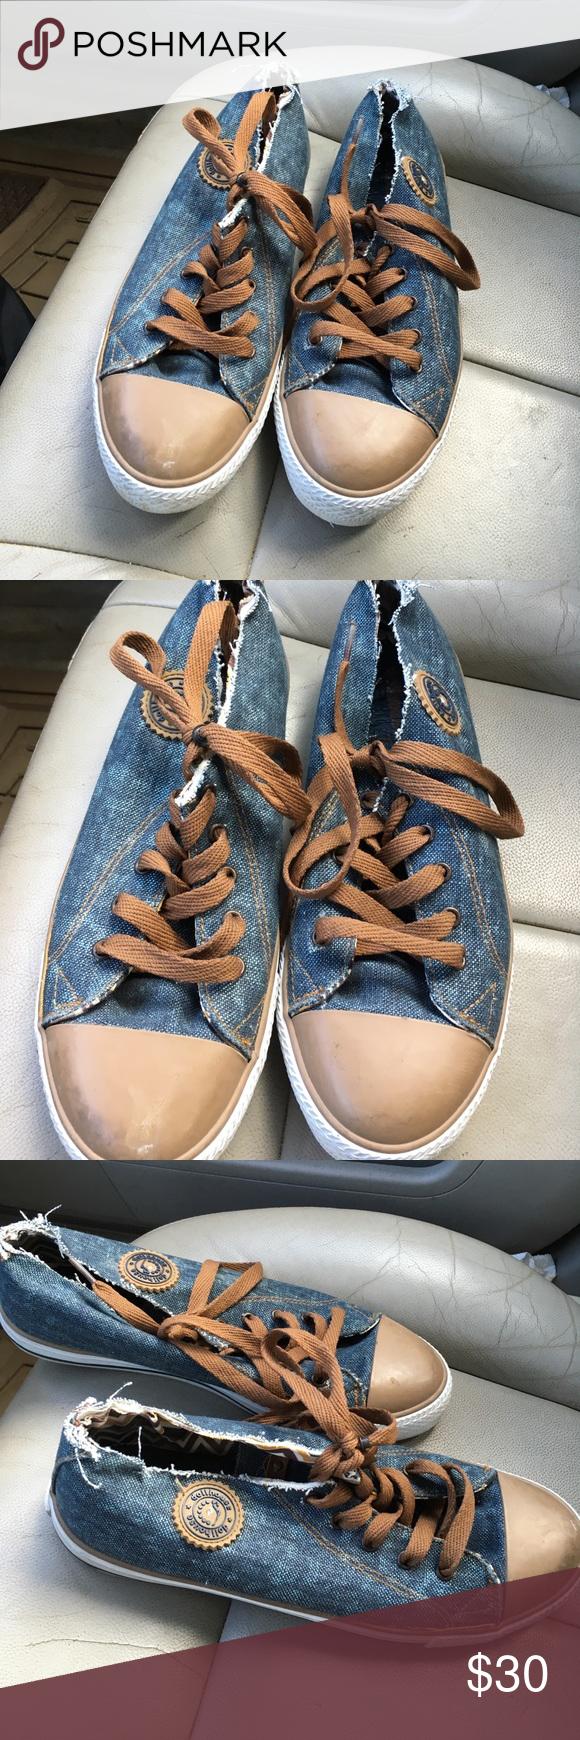 🎉Gorgeous Dollhouse tennis shoes